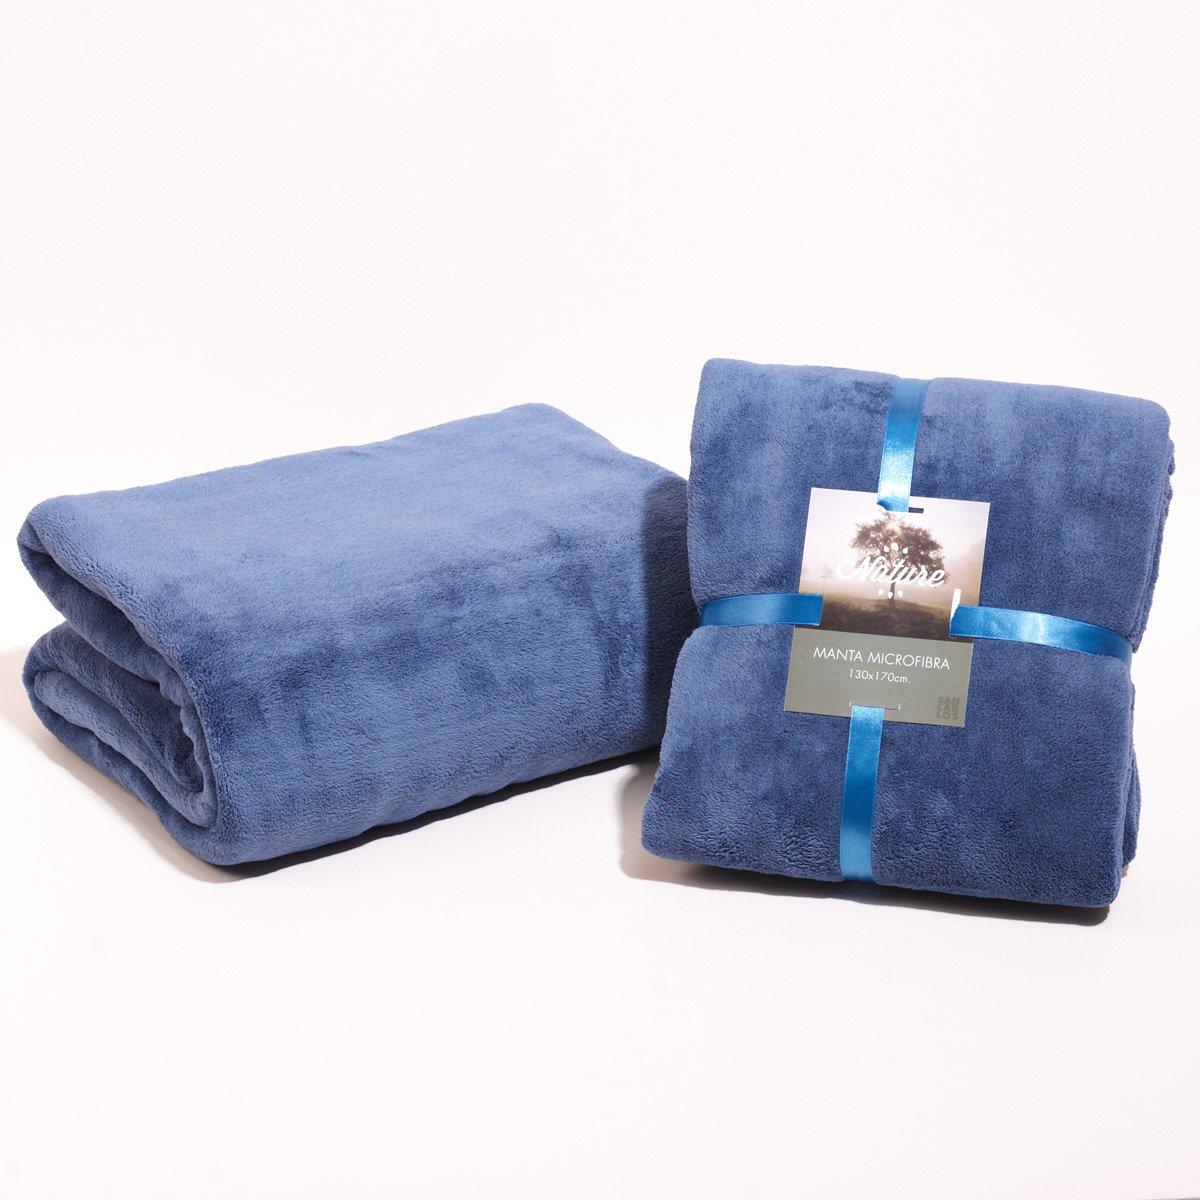 Sancarlos - Manta lisa microfibra azul - microfibra 300 g. - Cama 150, 235x240 cm - azul